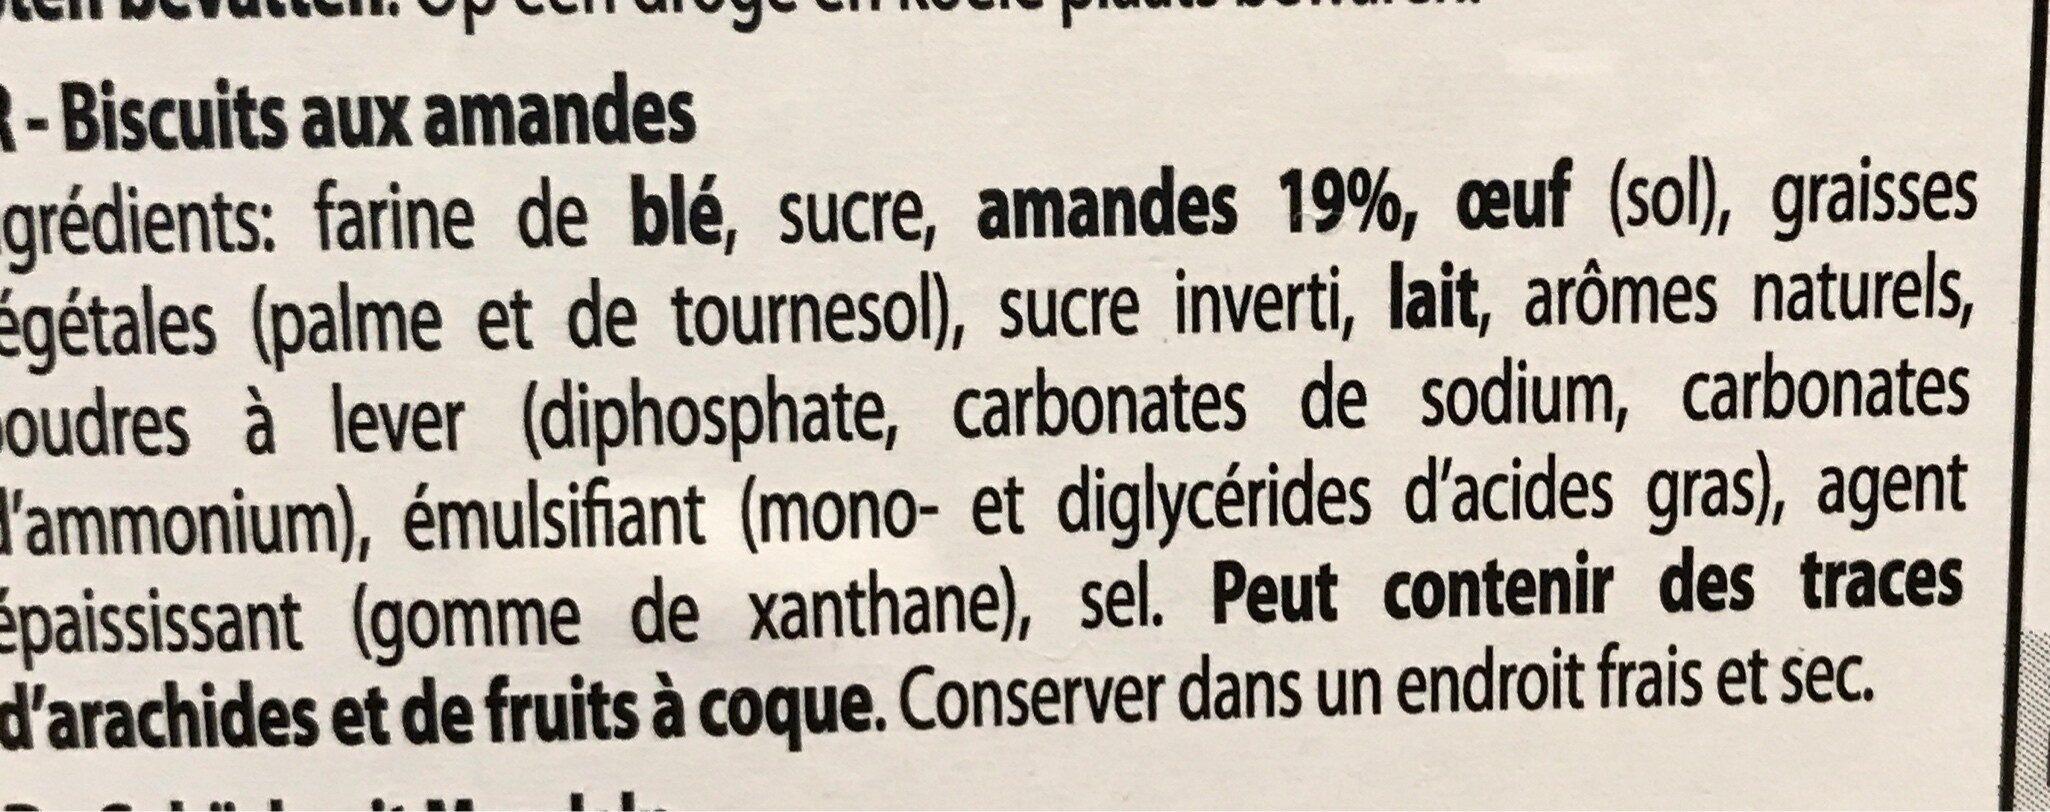 Cantucci - Ingrediënten